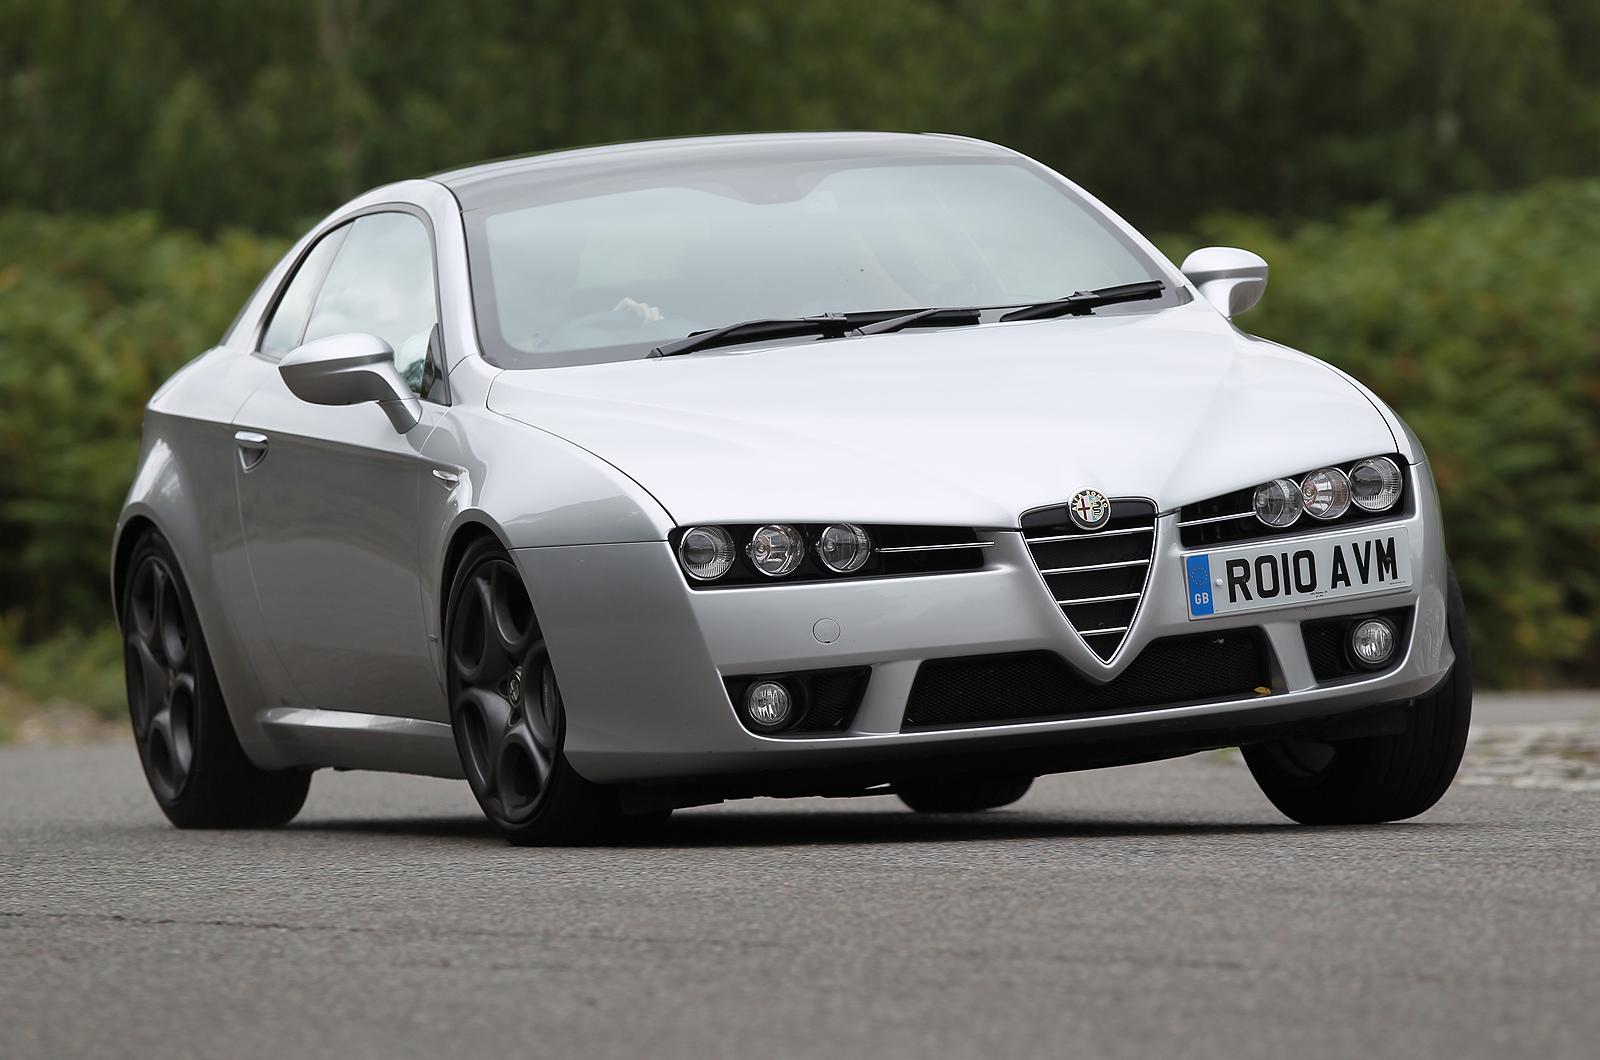 Alfa Romeo Brera 1750 TBi Review | Autocar